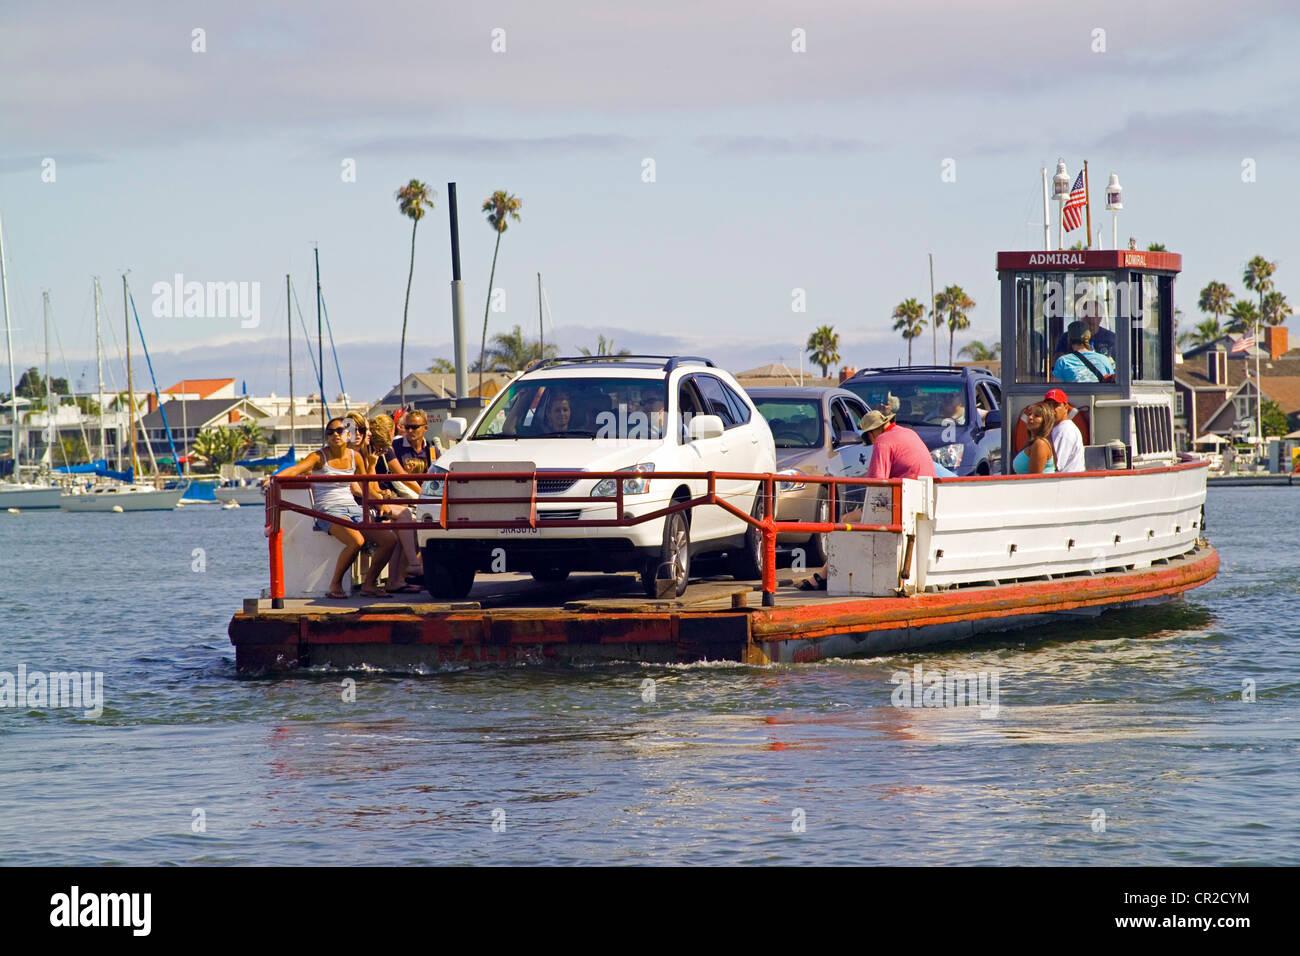 Historic Three Car Ferryboats Cross Newport Harbor Between The Fun